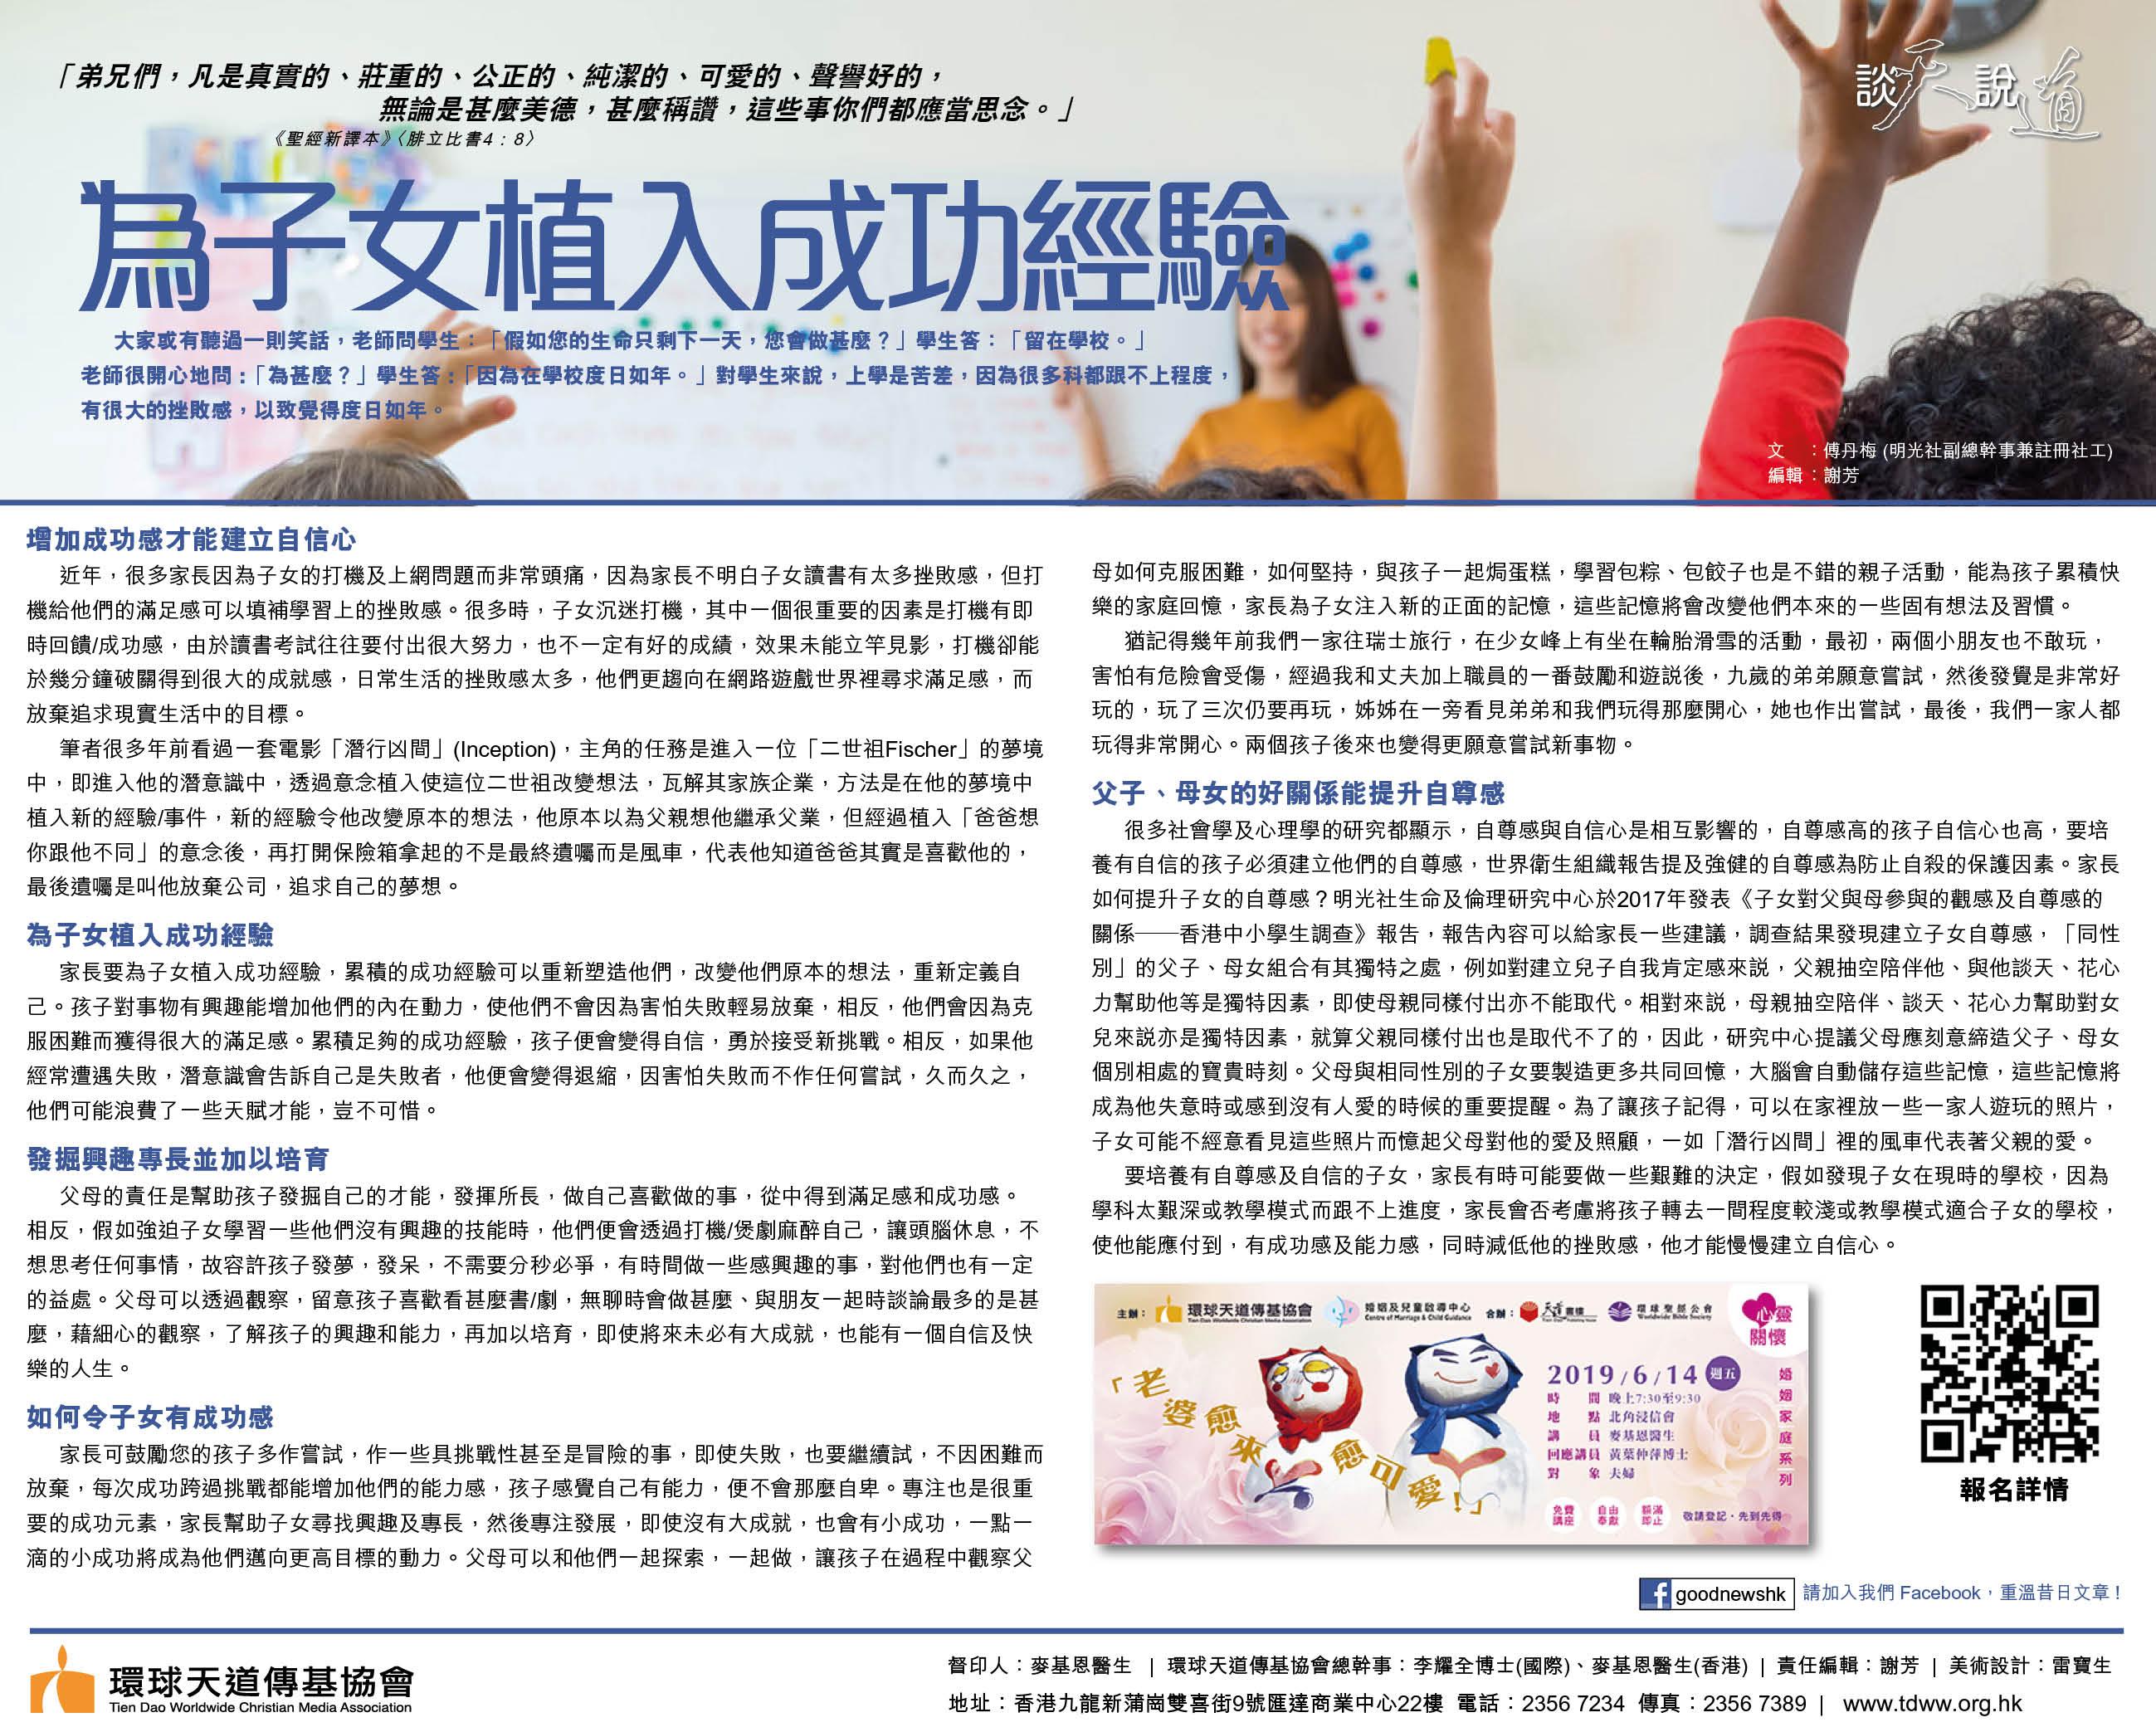 TSTR_June_10_2019為子女植入成功經驗